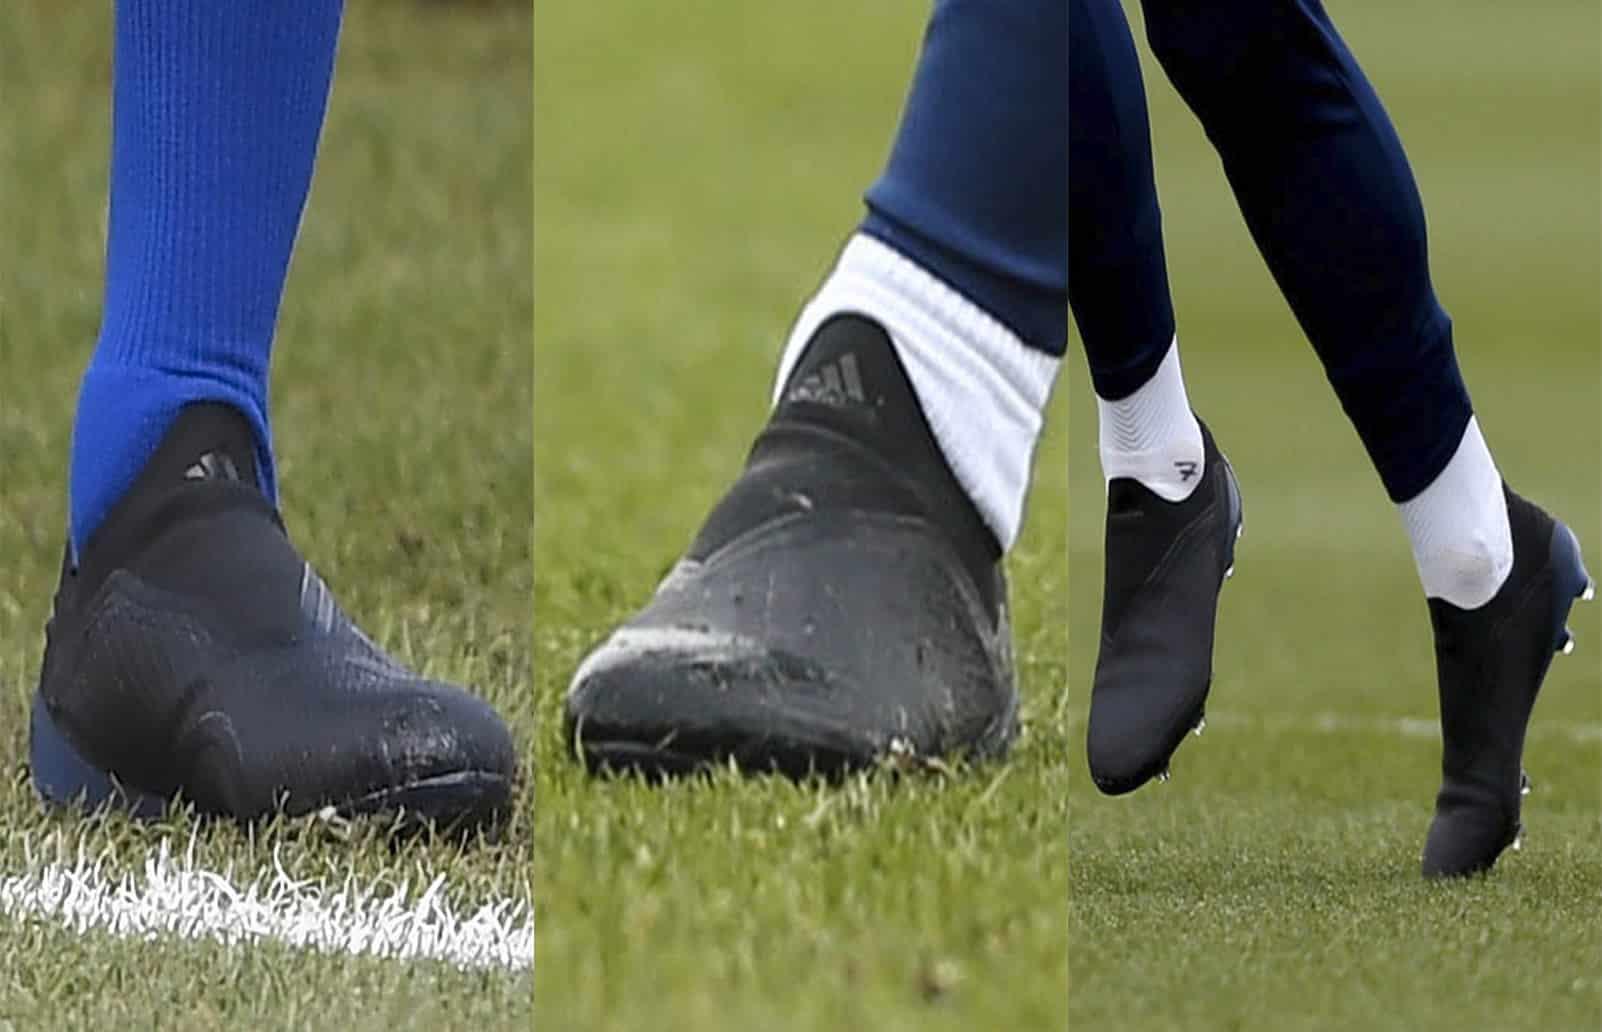 f0122d5e1a75 Adidas X18 1. adidas x 18 1 fg football blue adidas soccer cleats ...